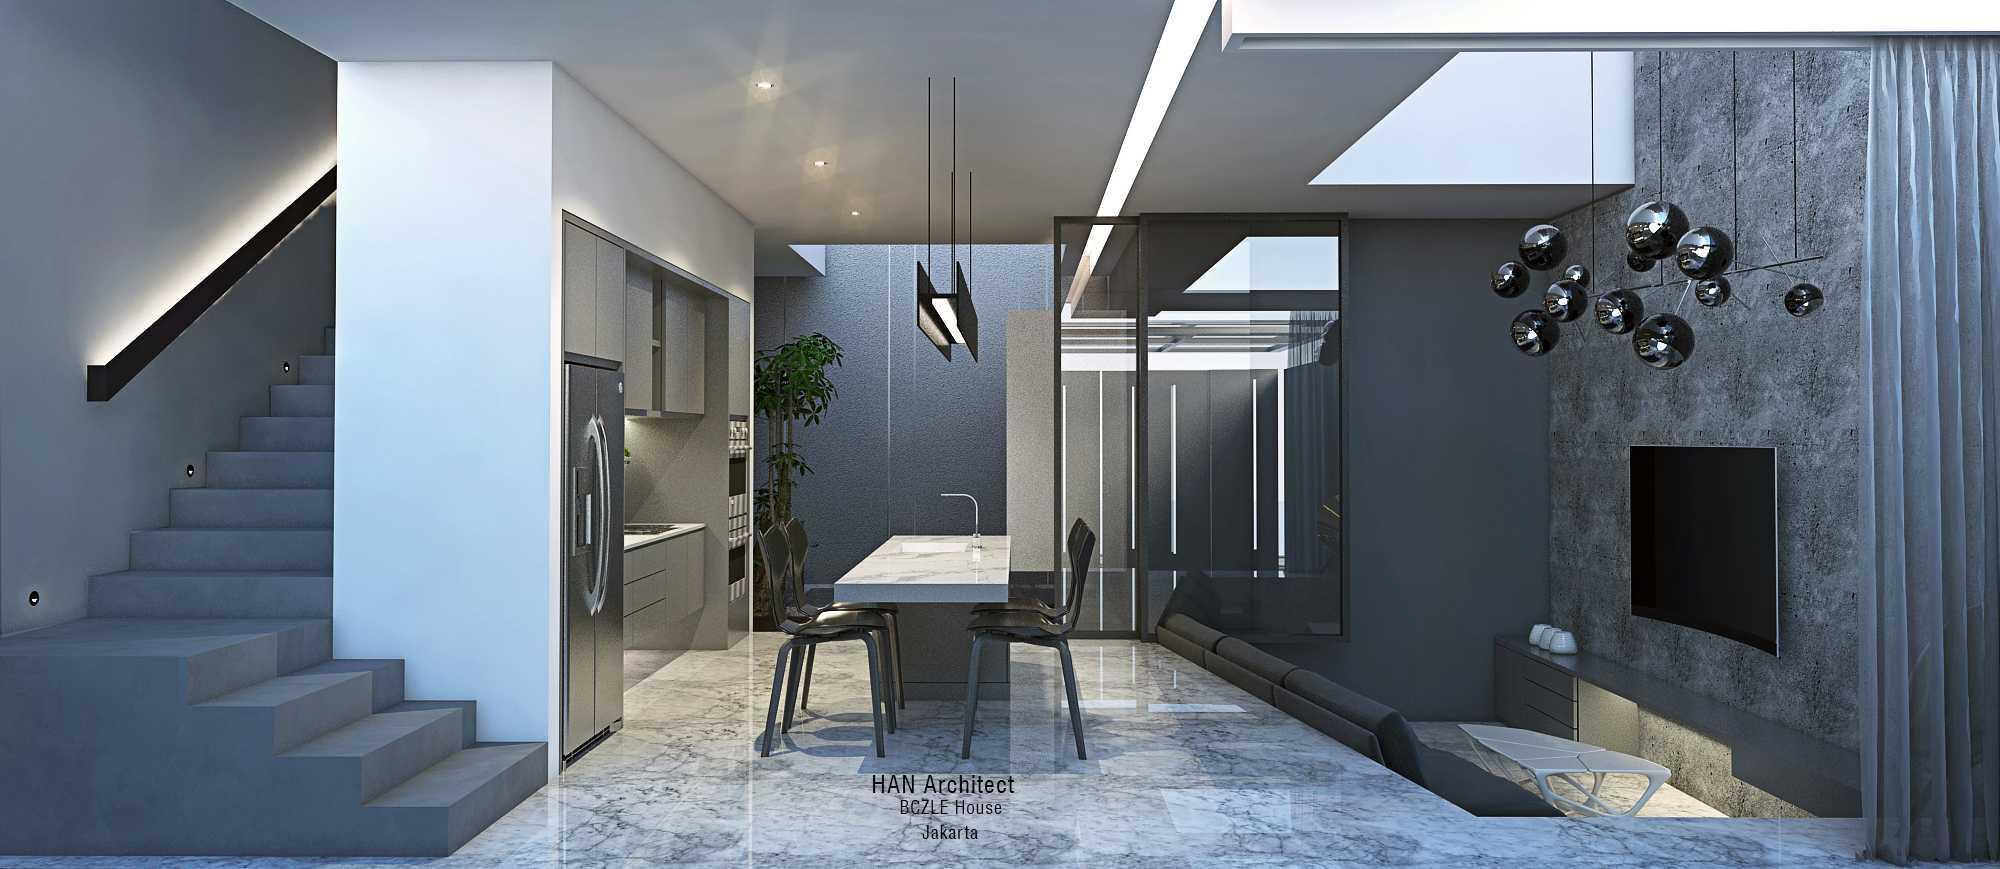 Han Architect B House Jakarta Jakarta Living-1A   27920